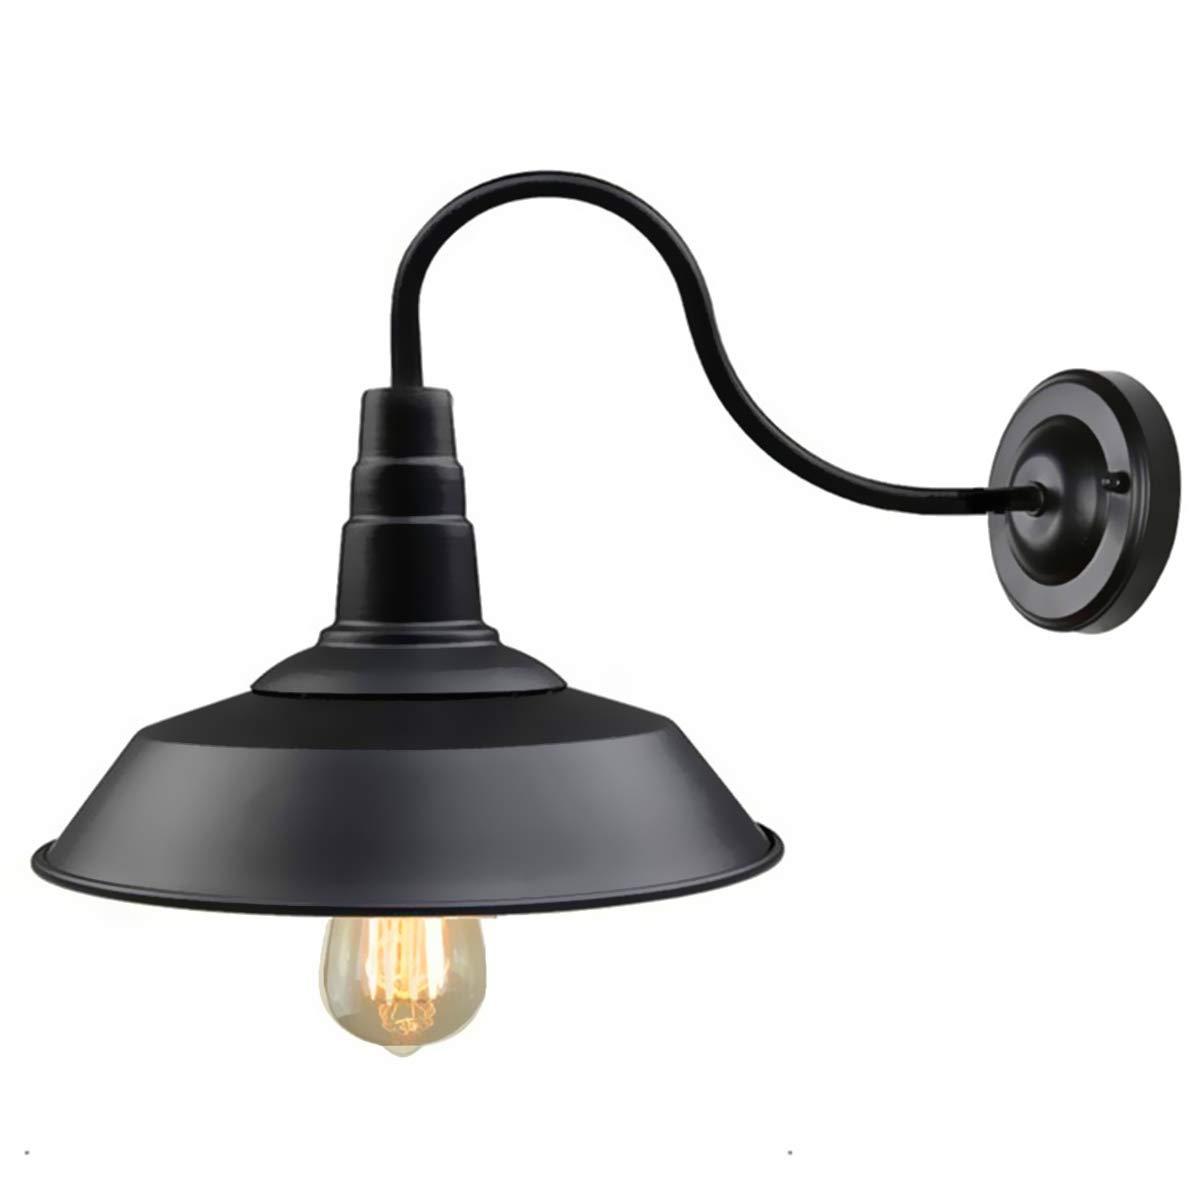 Retro black wall sconce lighting gooseneck barn lights industrial vintage farmhouse wall lamp led porch light